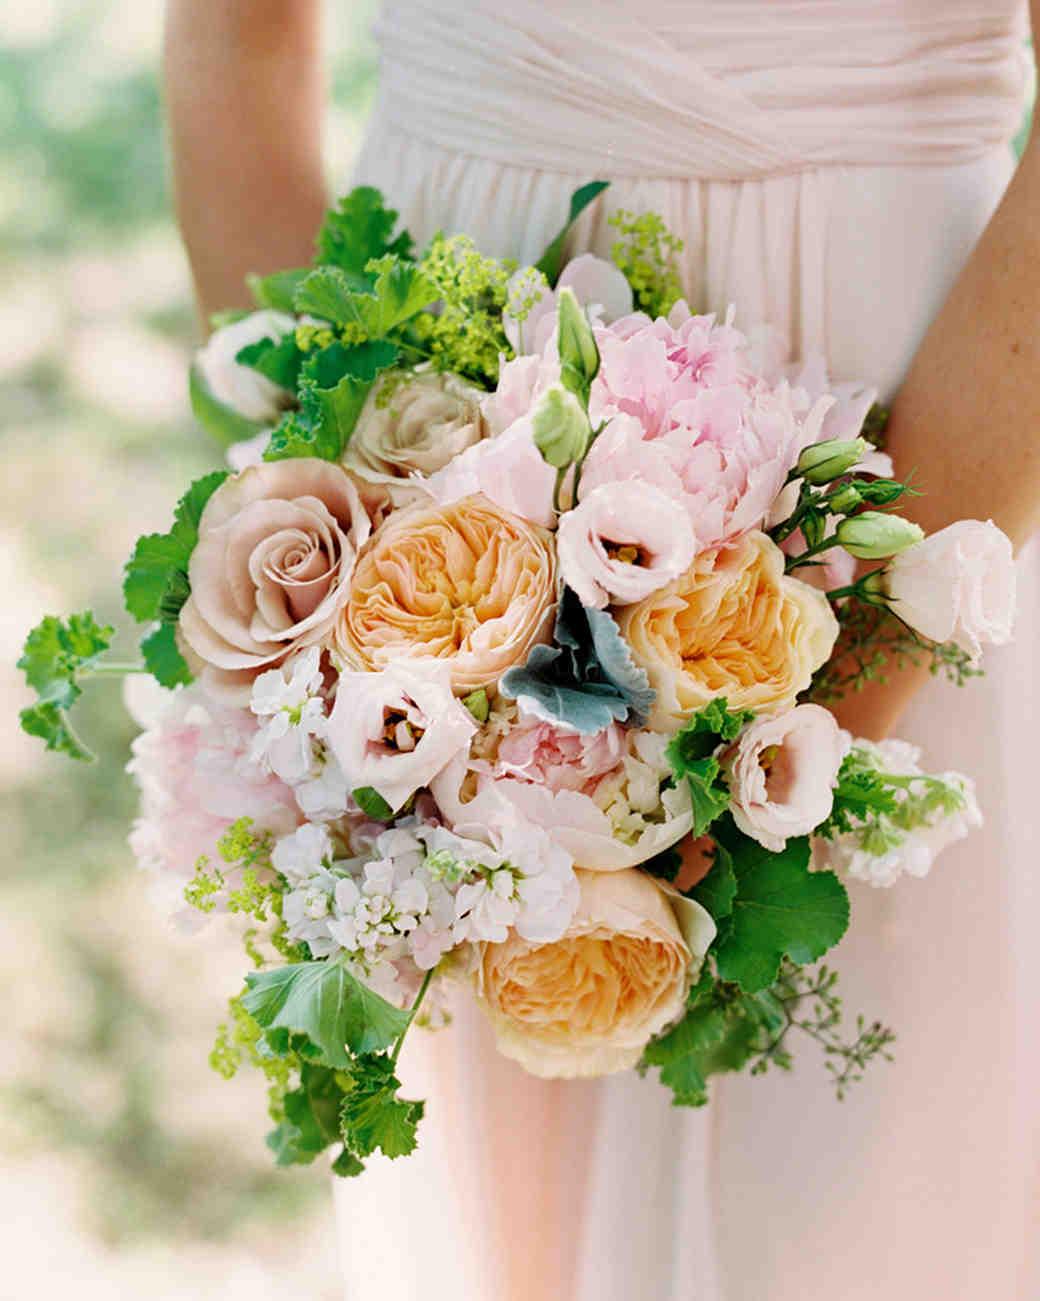 tiler-robbie-bridesmaid-bouquet-001-d111357.jpg